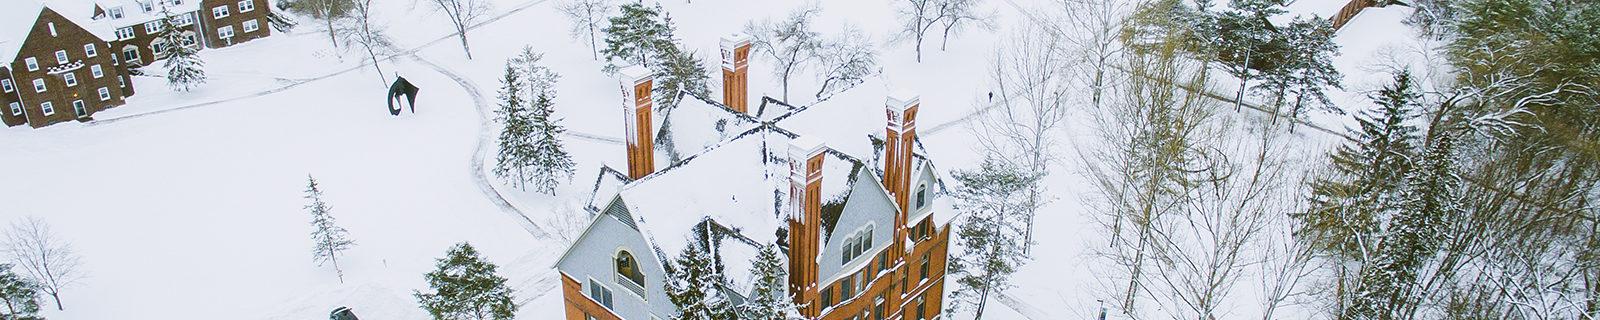 Northland College Winter Campus aerial view